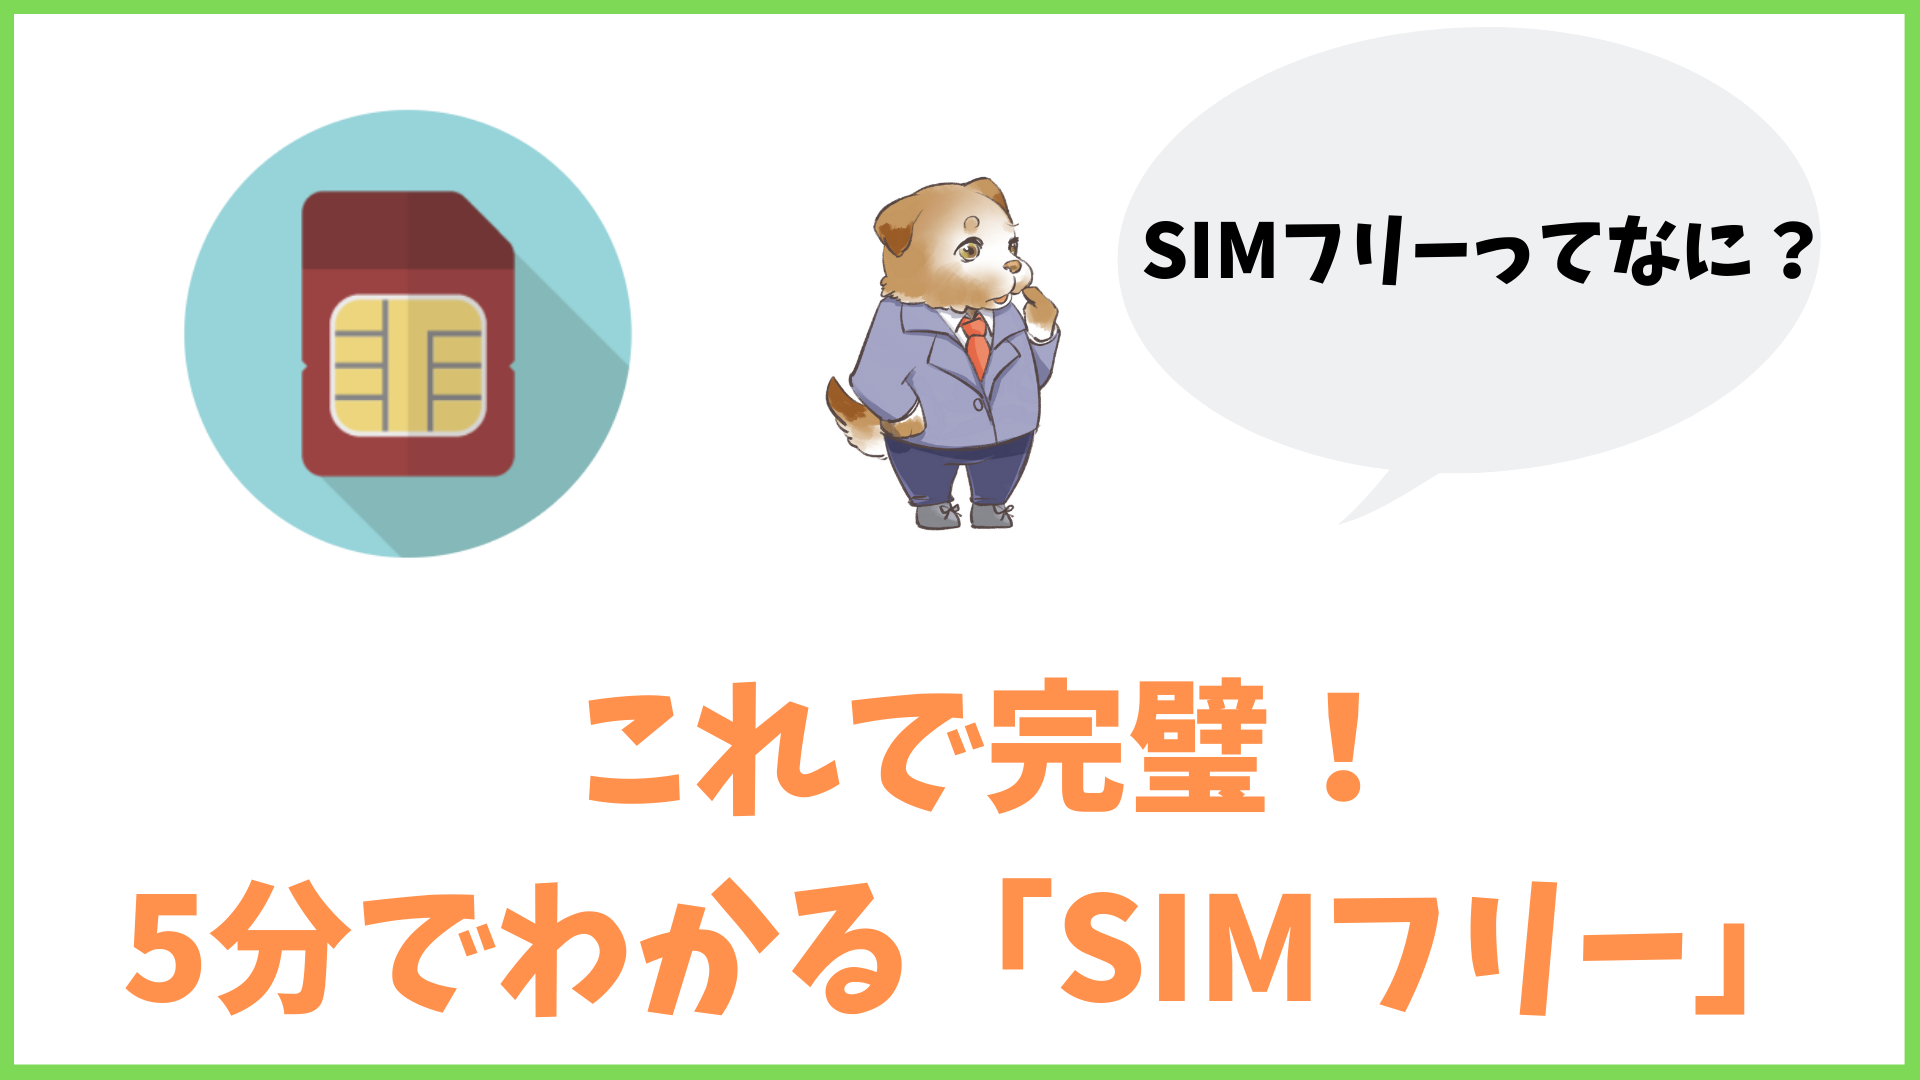 SIMフリー、SIMロック解除とは?5分でわかる簡単講座